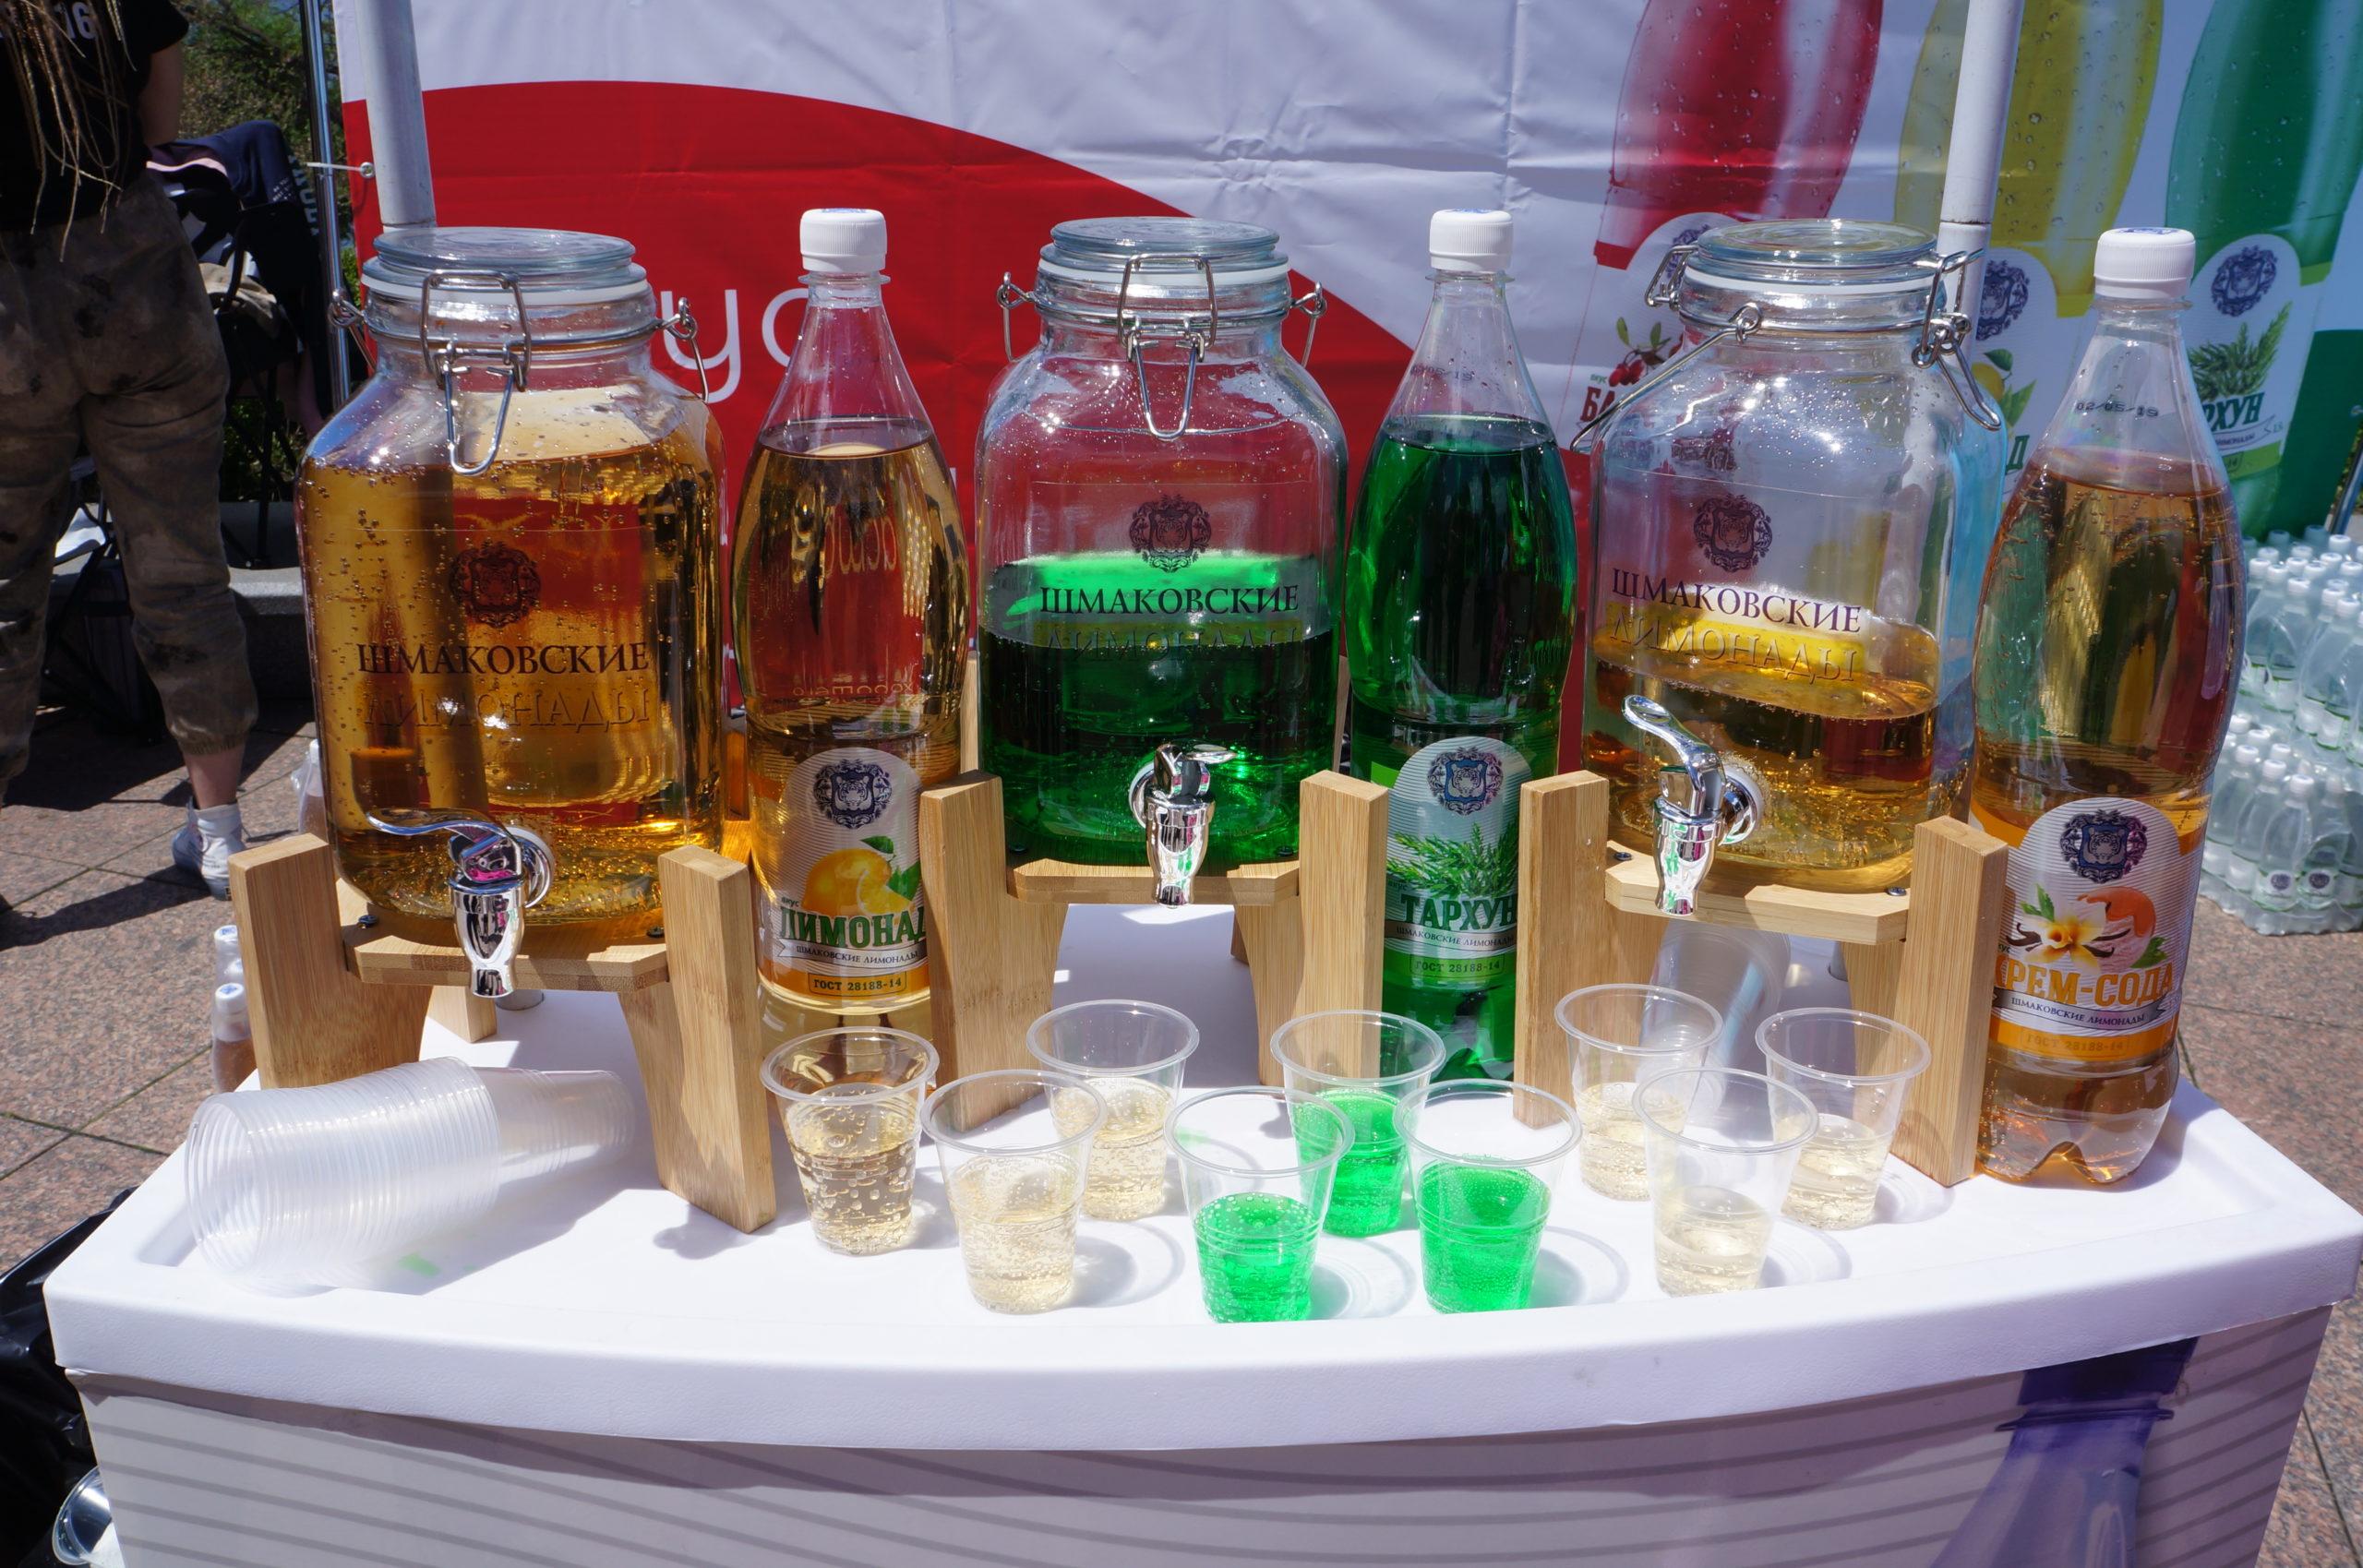 """Shmakovsky lemonades"" - tastes: Tarhun, Lemonade, Cream - soda"